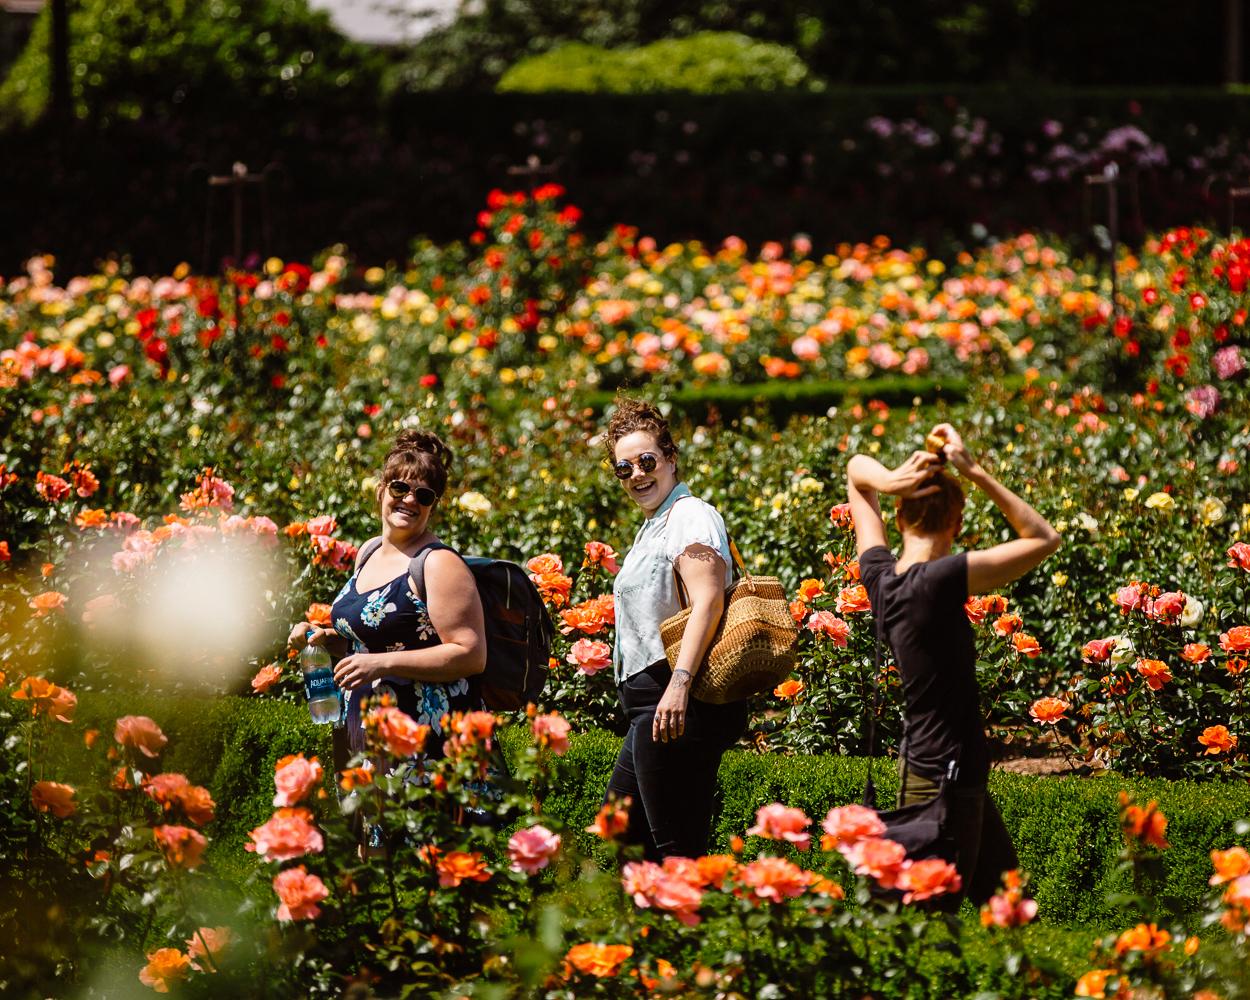 three women walk through rows of roses